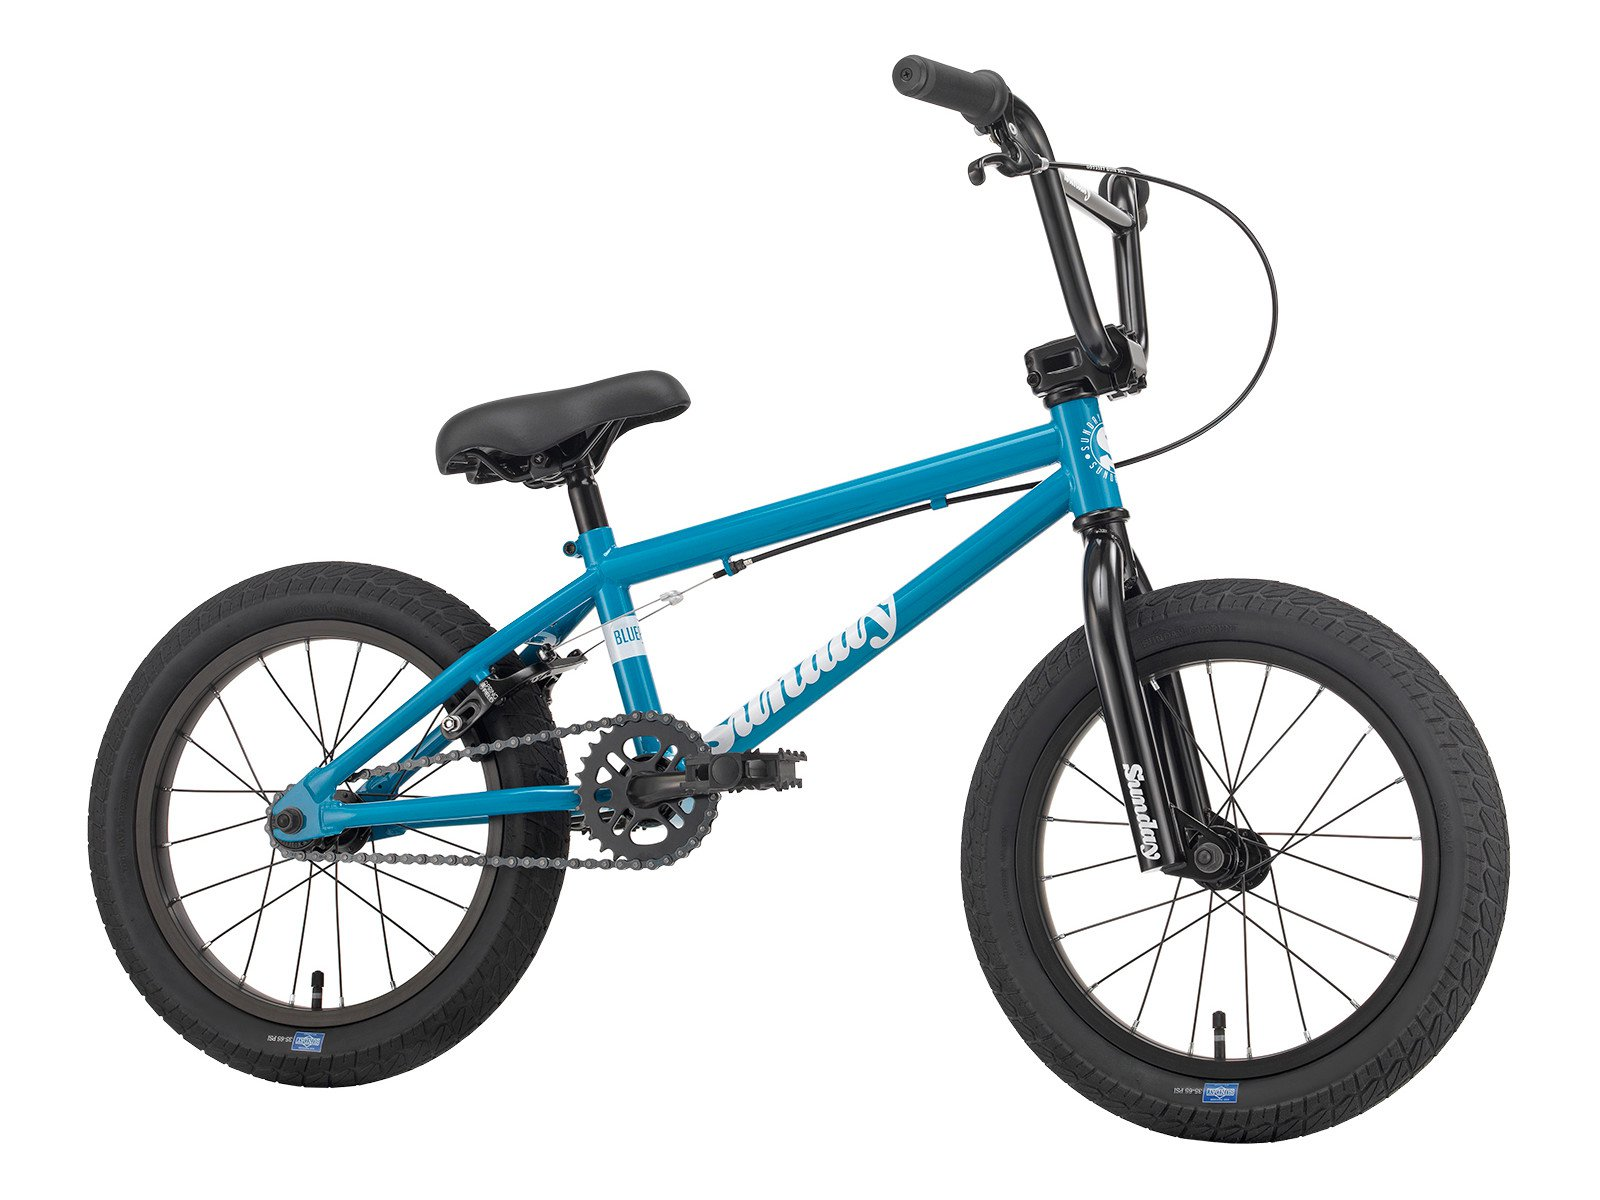 Sunday bikes blueprint 16 2018 bmx bike 16 inch teal blue sunday bikes blueprint 16 2018 bmx bike 16 inch teal blue malvernweather Images